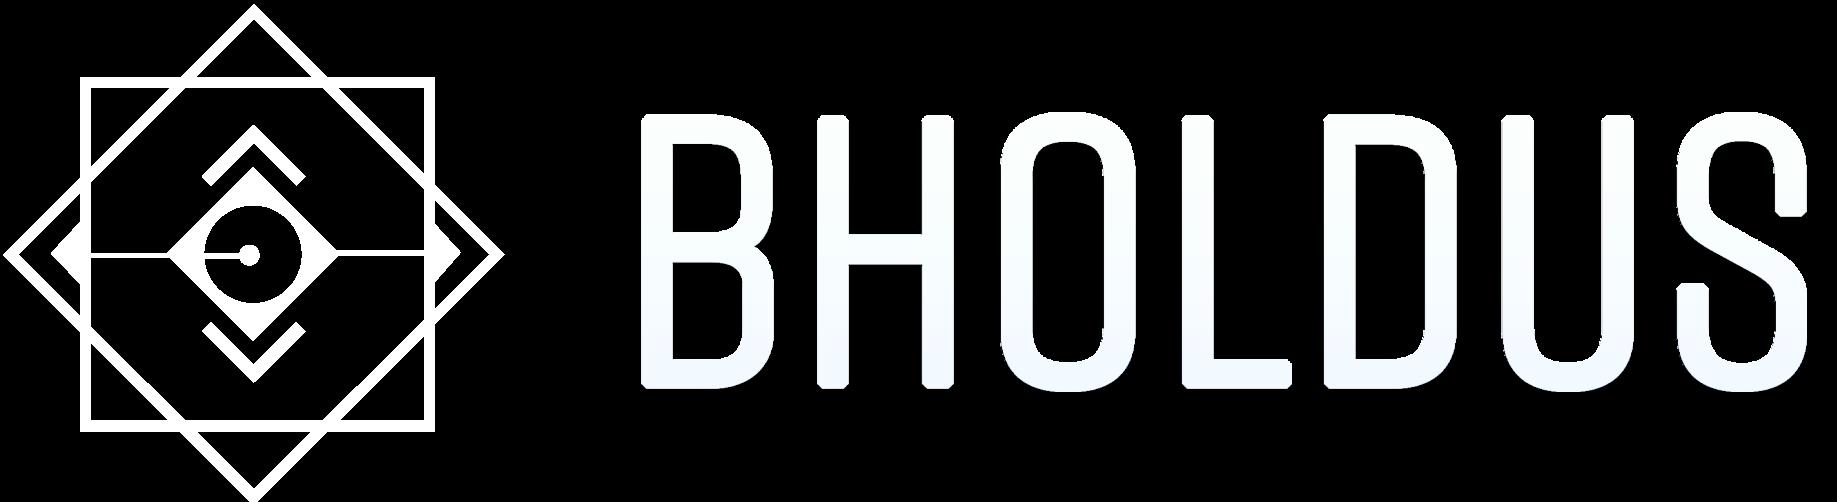 https://solidproof.io/storage/logos/B2kbuwXiUpETZx9U4AMnX5OfTTzyIDrQWVSDh7LI.png